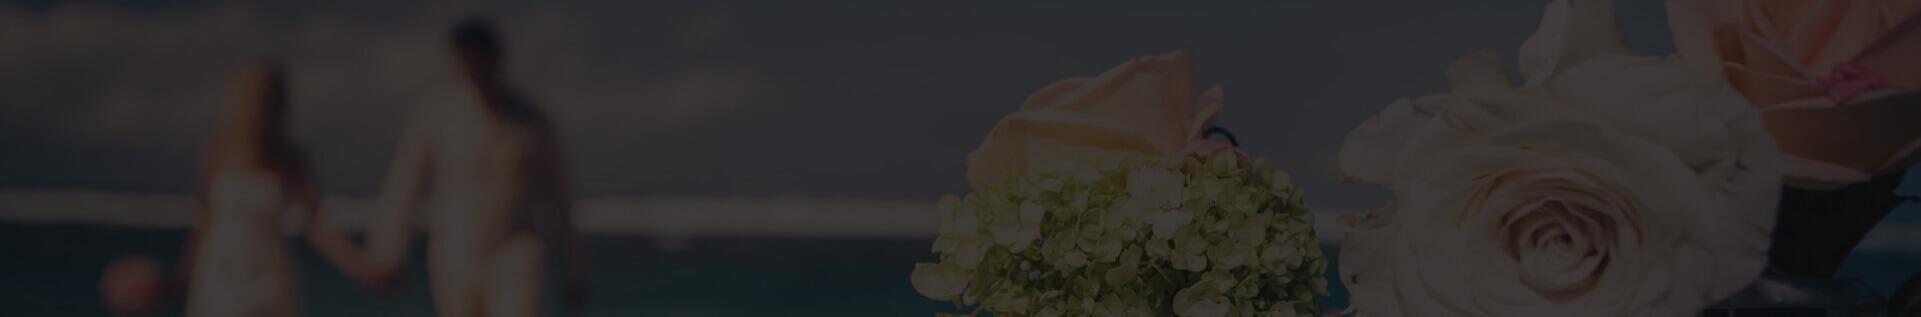 Welcome to JA Resorts & Hotels Weddings